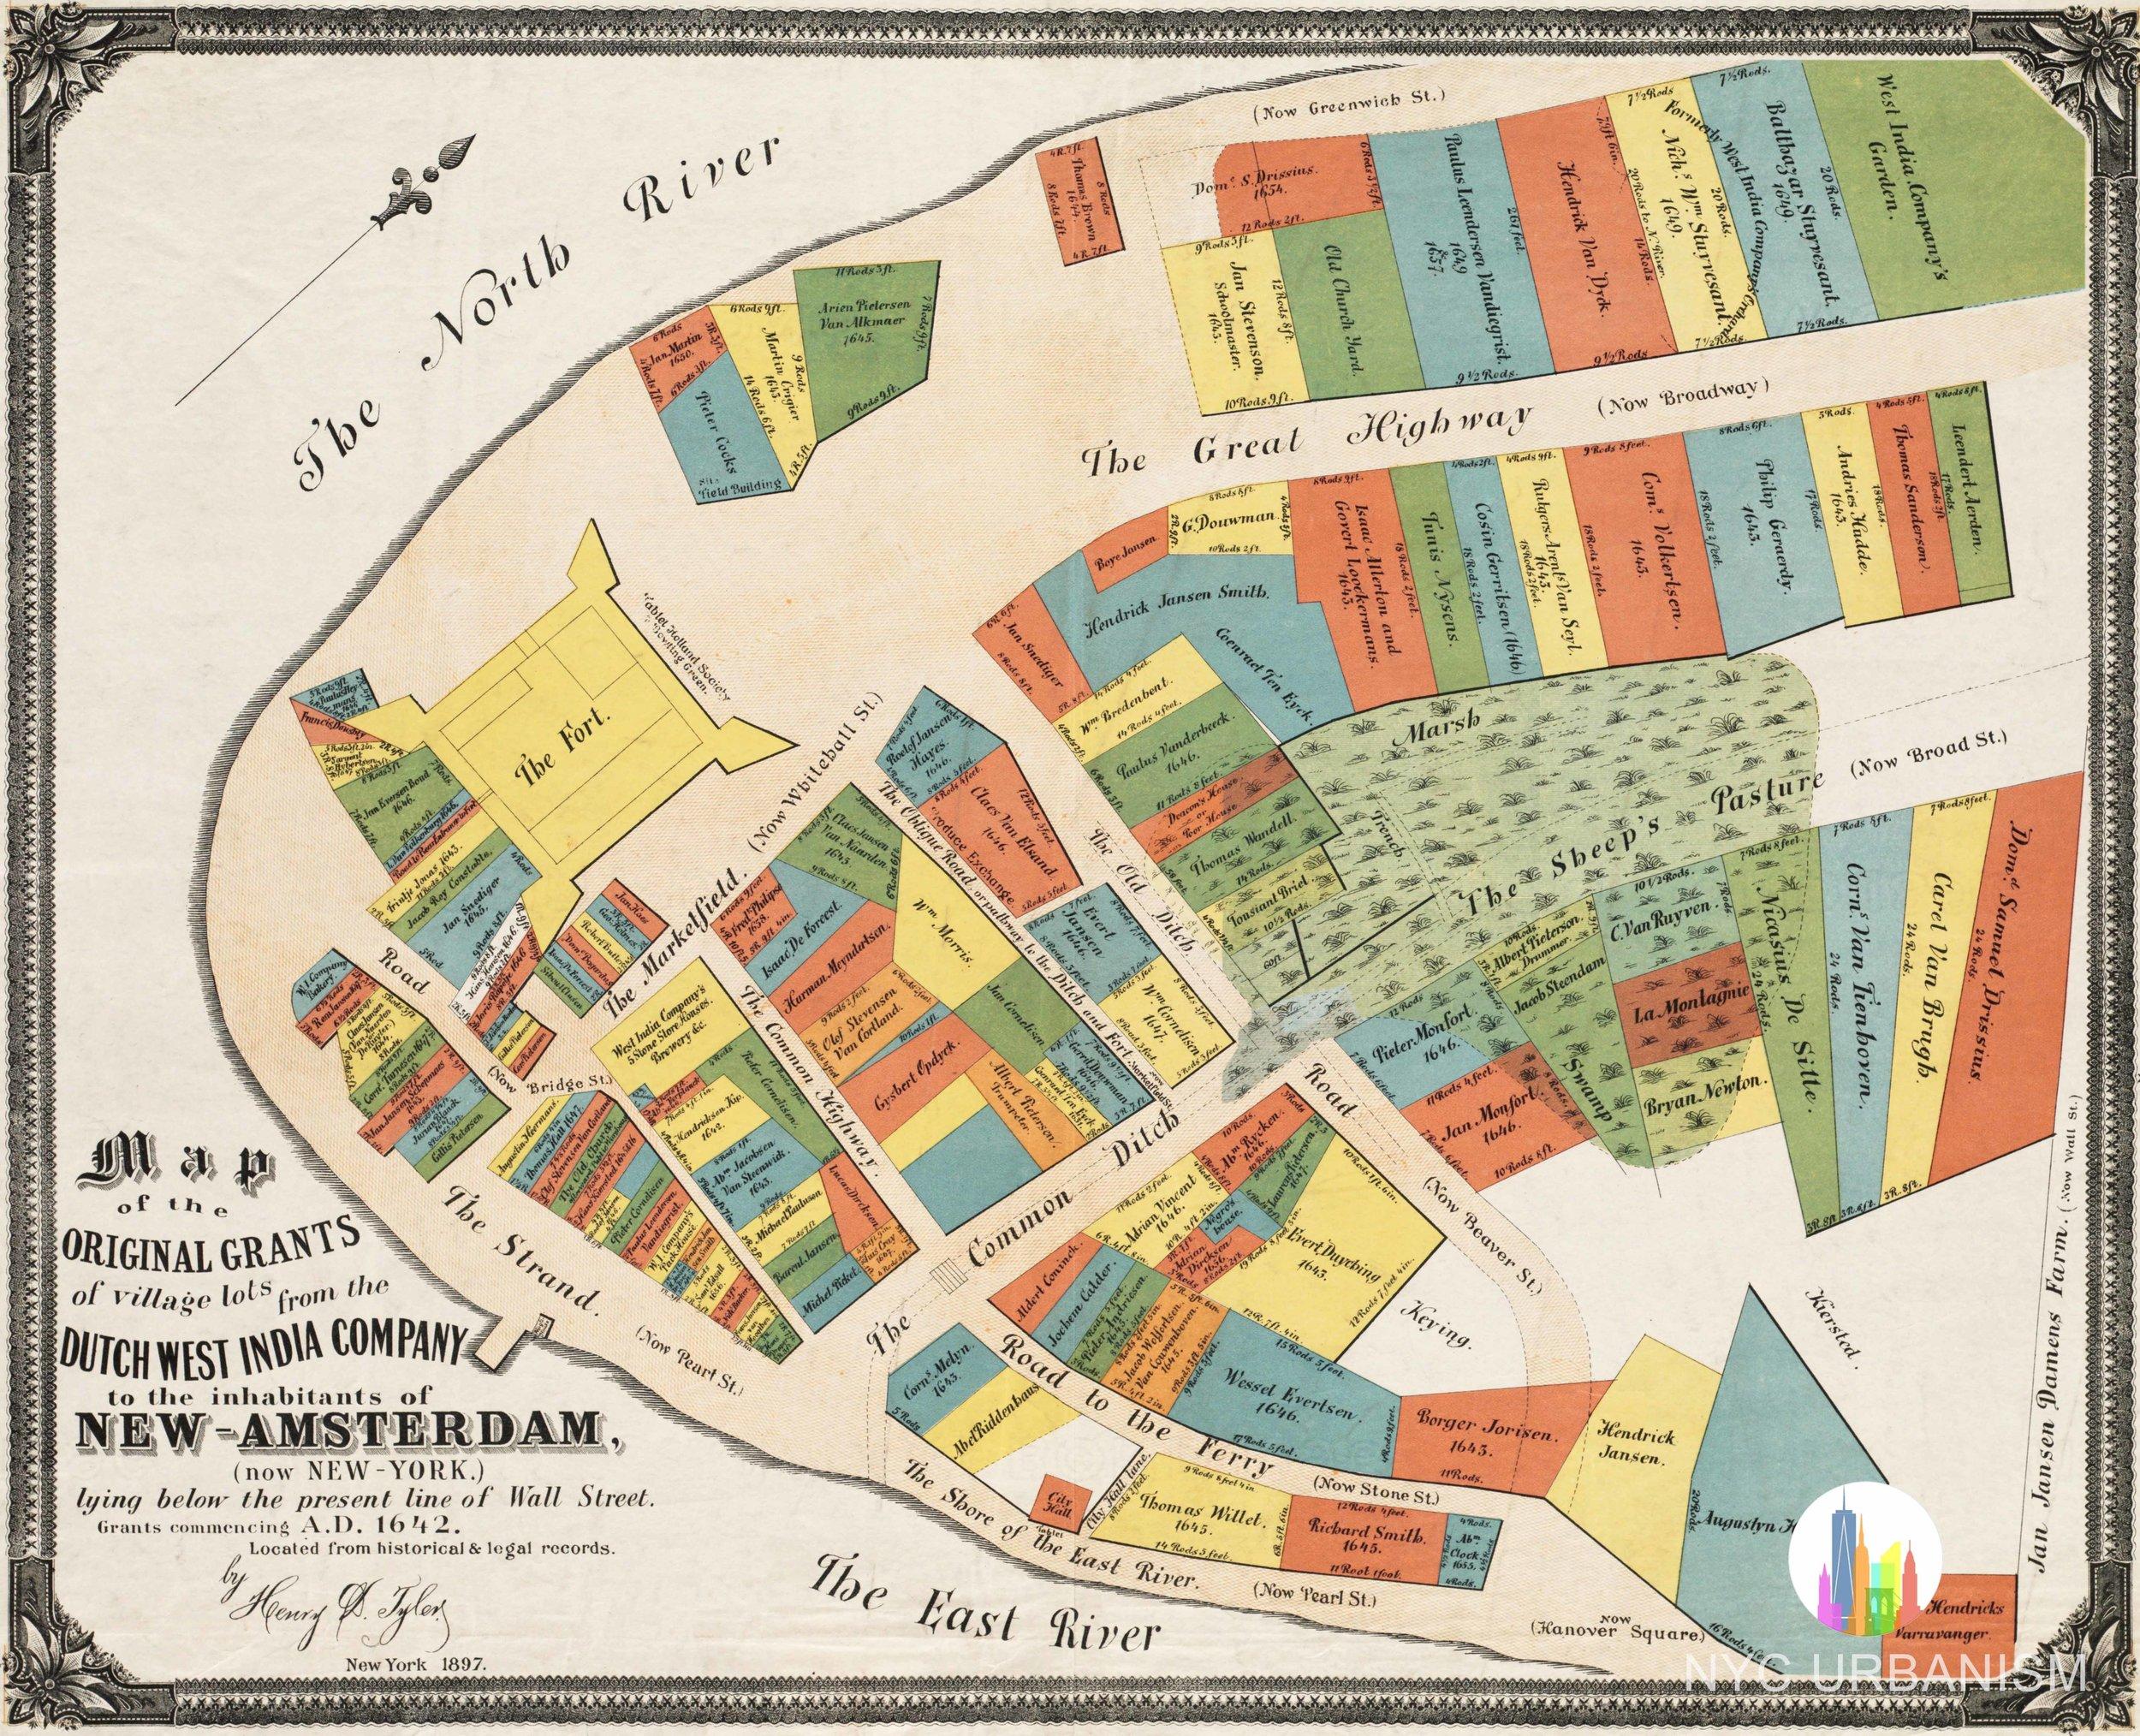 1642 Dutch West India map of New Amsterdam — NYC URBANISM on map of united kingdom, map south india, map of united arab emirates, map of iran, map of singapore, map of rajasthan, map of khajuraho, map of mumbai, map of gujarat, map of pakistan, map of burma, map of goa, map of bihar, map of kerala, map of kolkata, map of assam, world map india, map of delhi, map of yemen, map of varanasi,